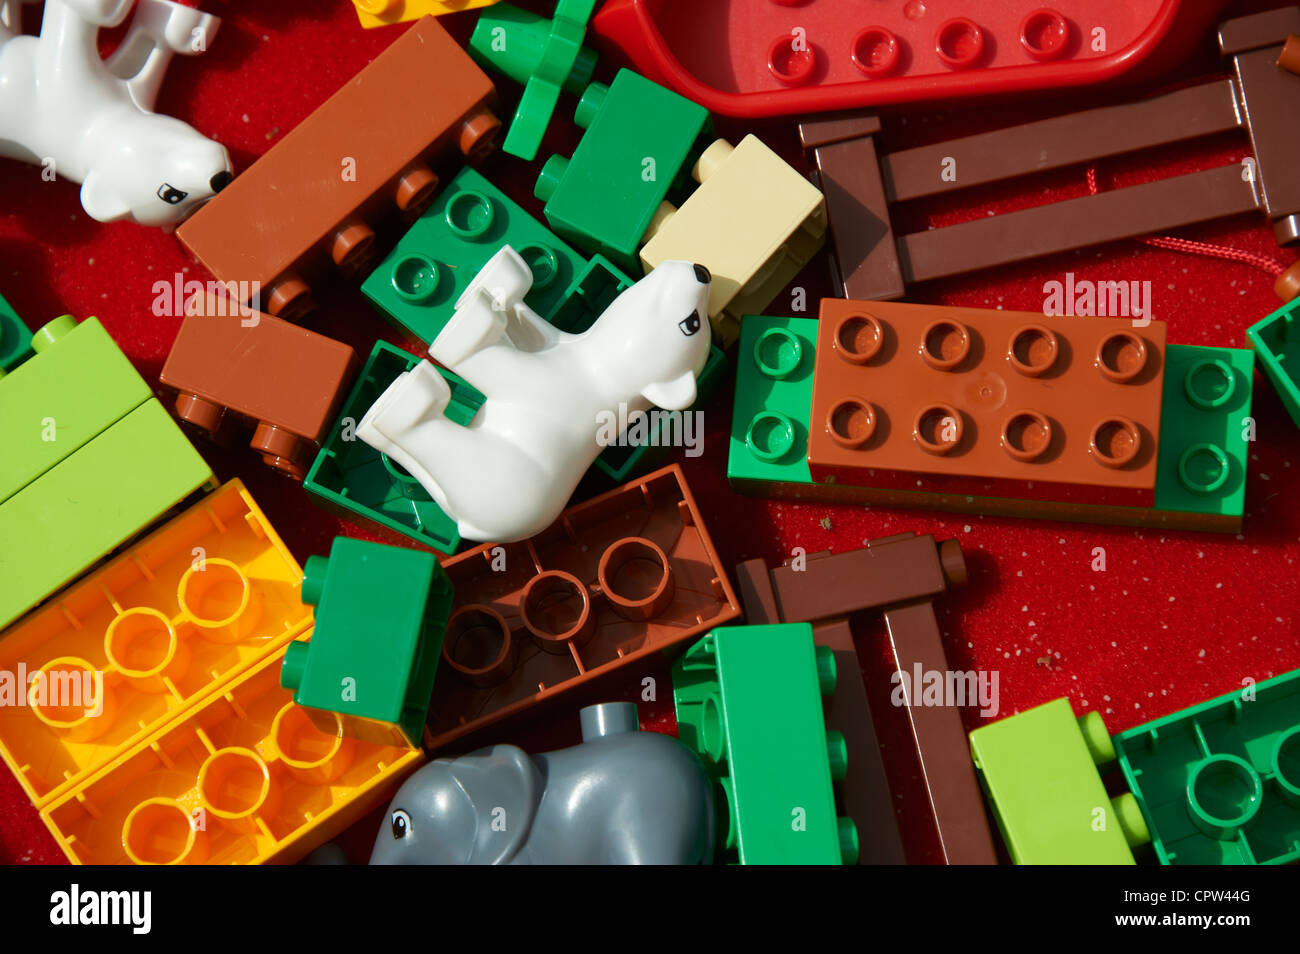 Lego Bricks And Animals